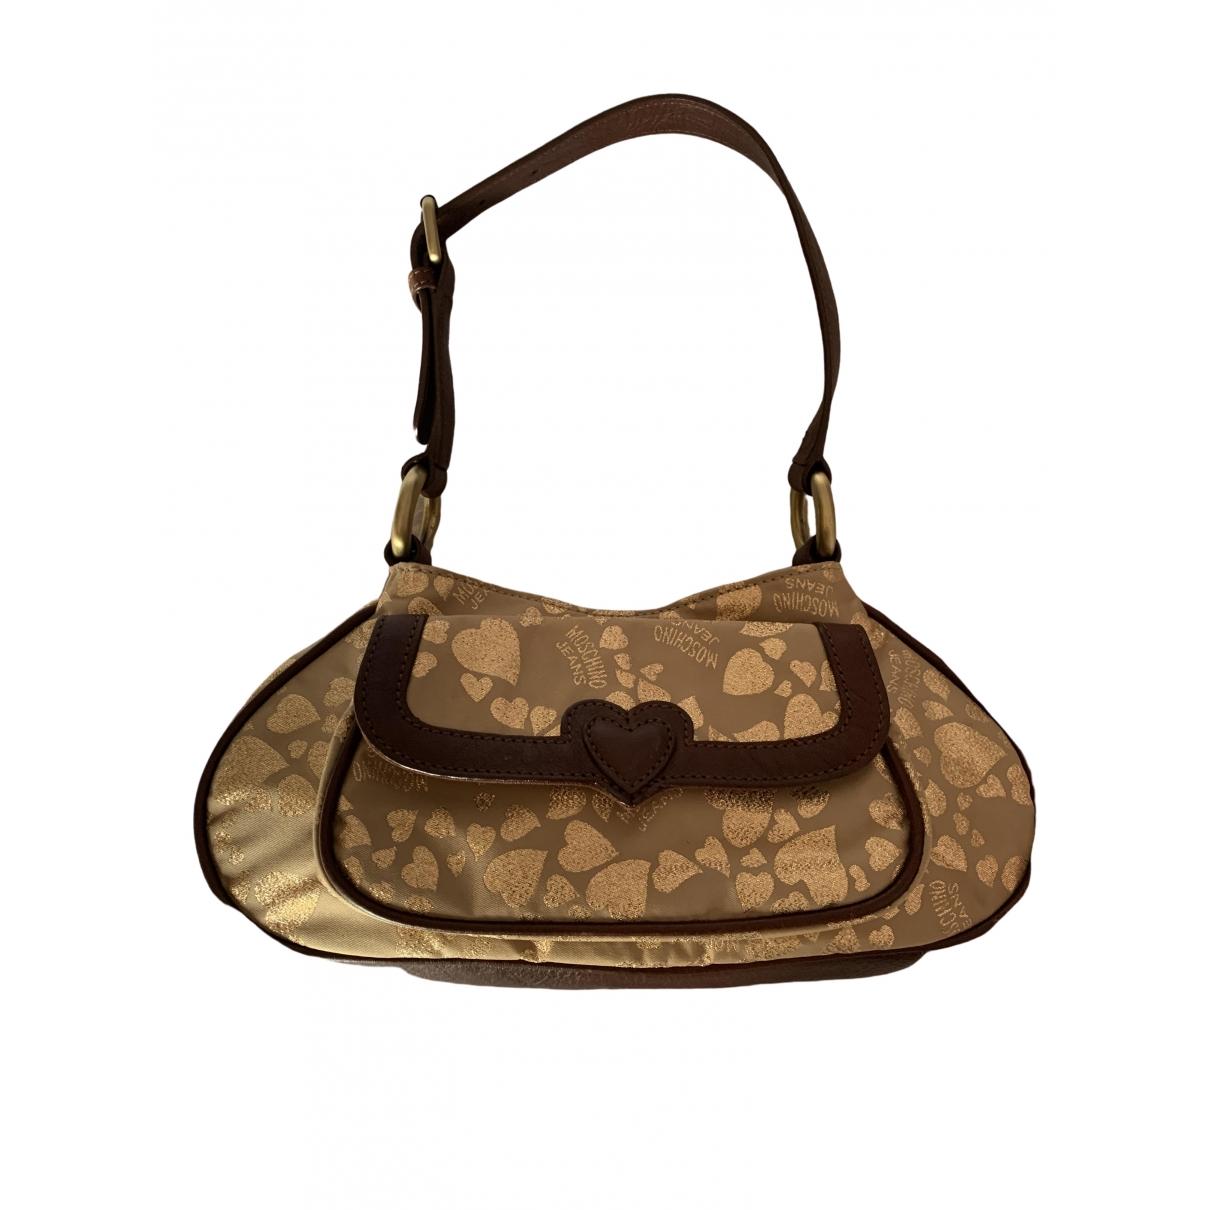 Moschino \N Cloth handbag for Women \N